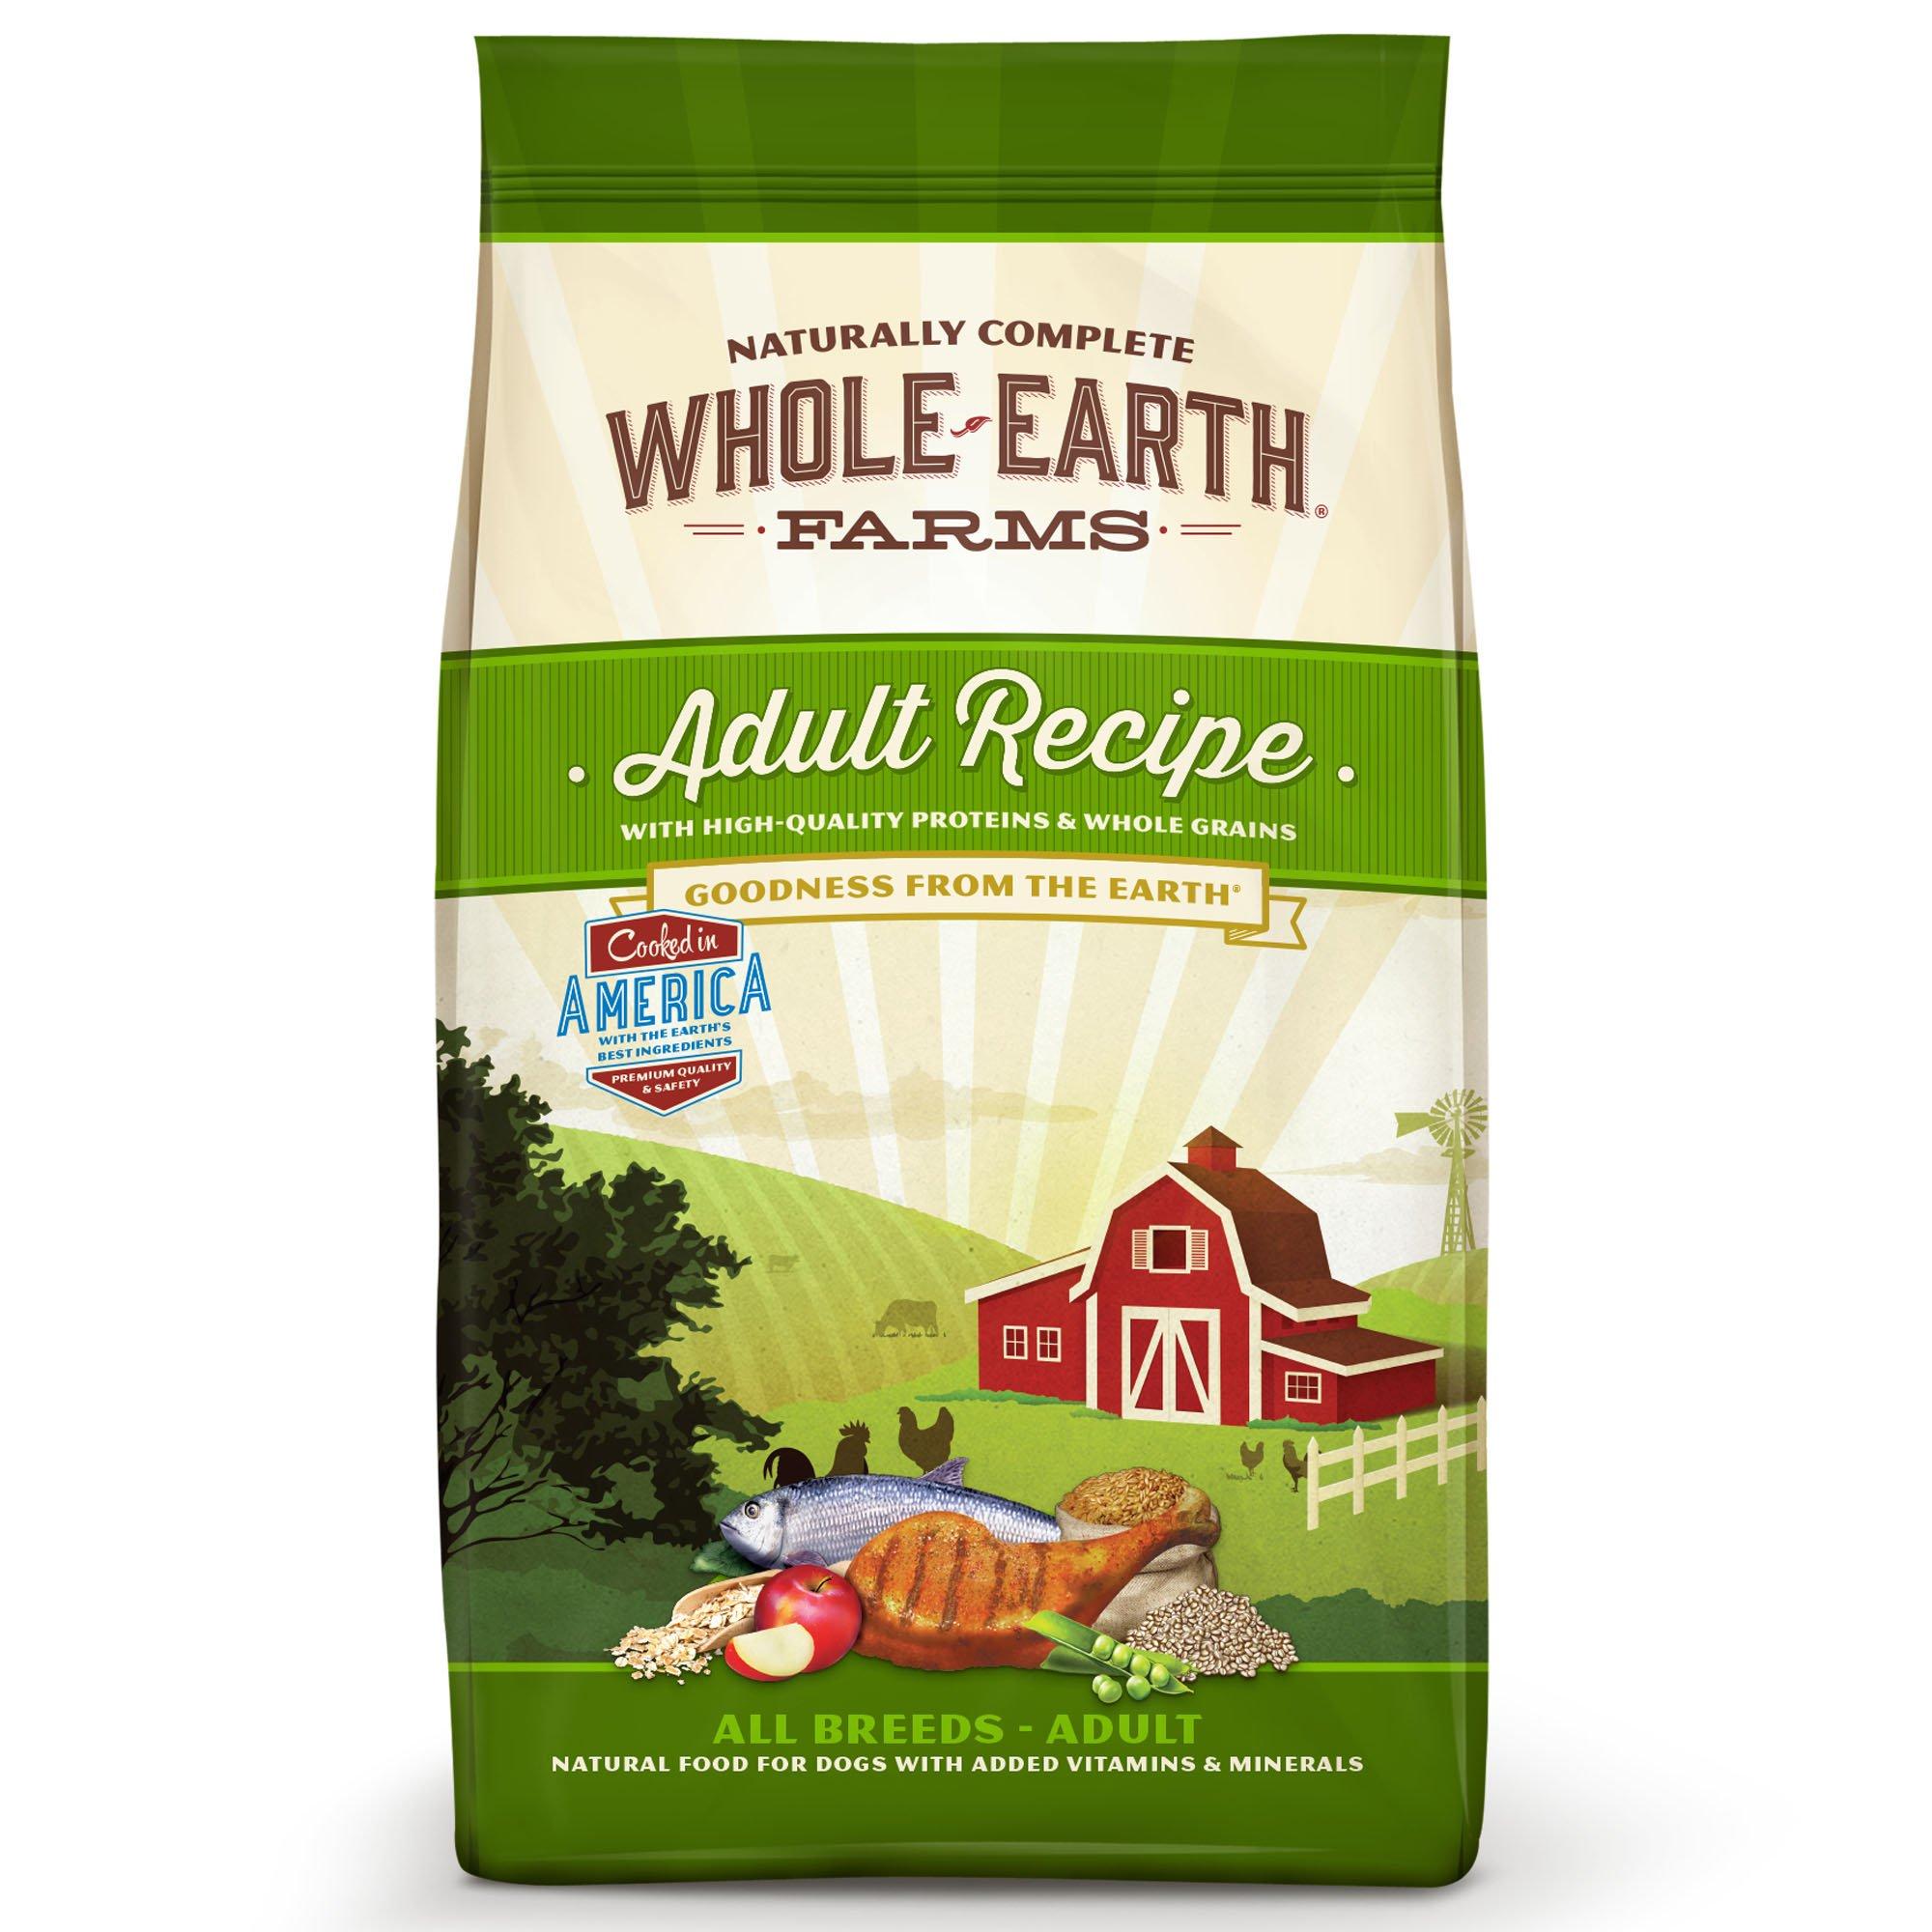 Whole Earth Farms Adult Dry Dog Food